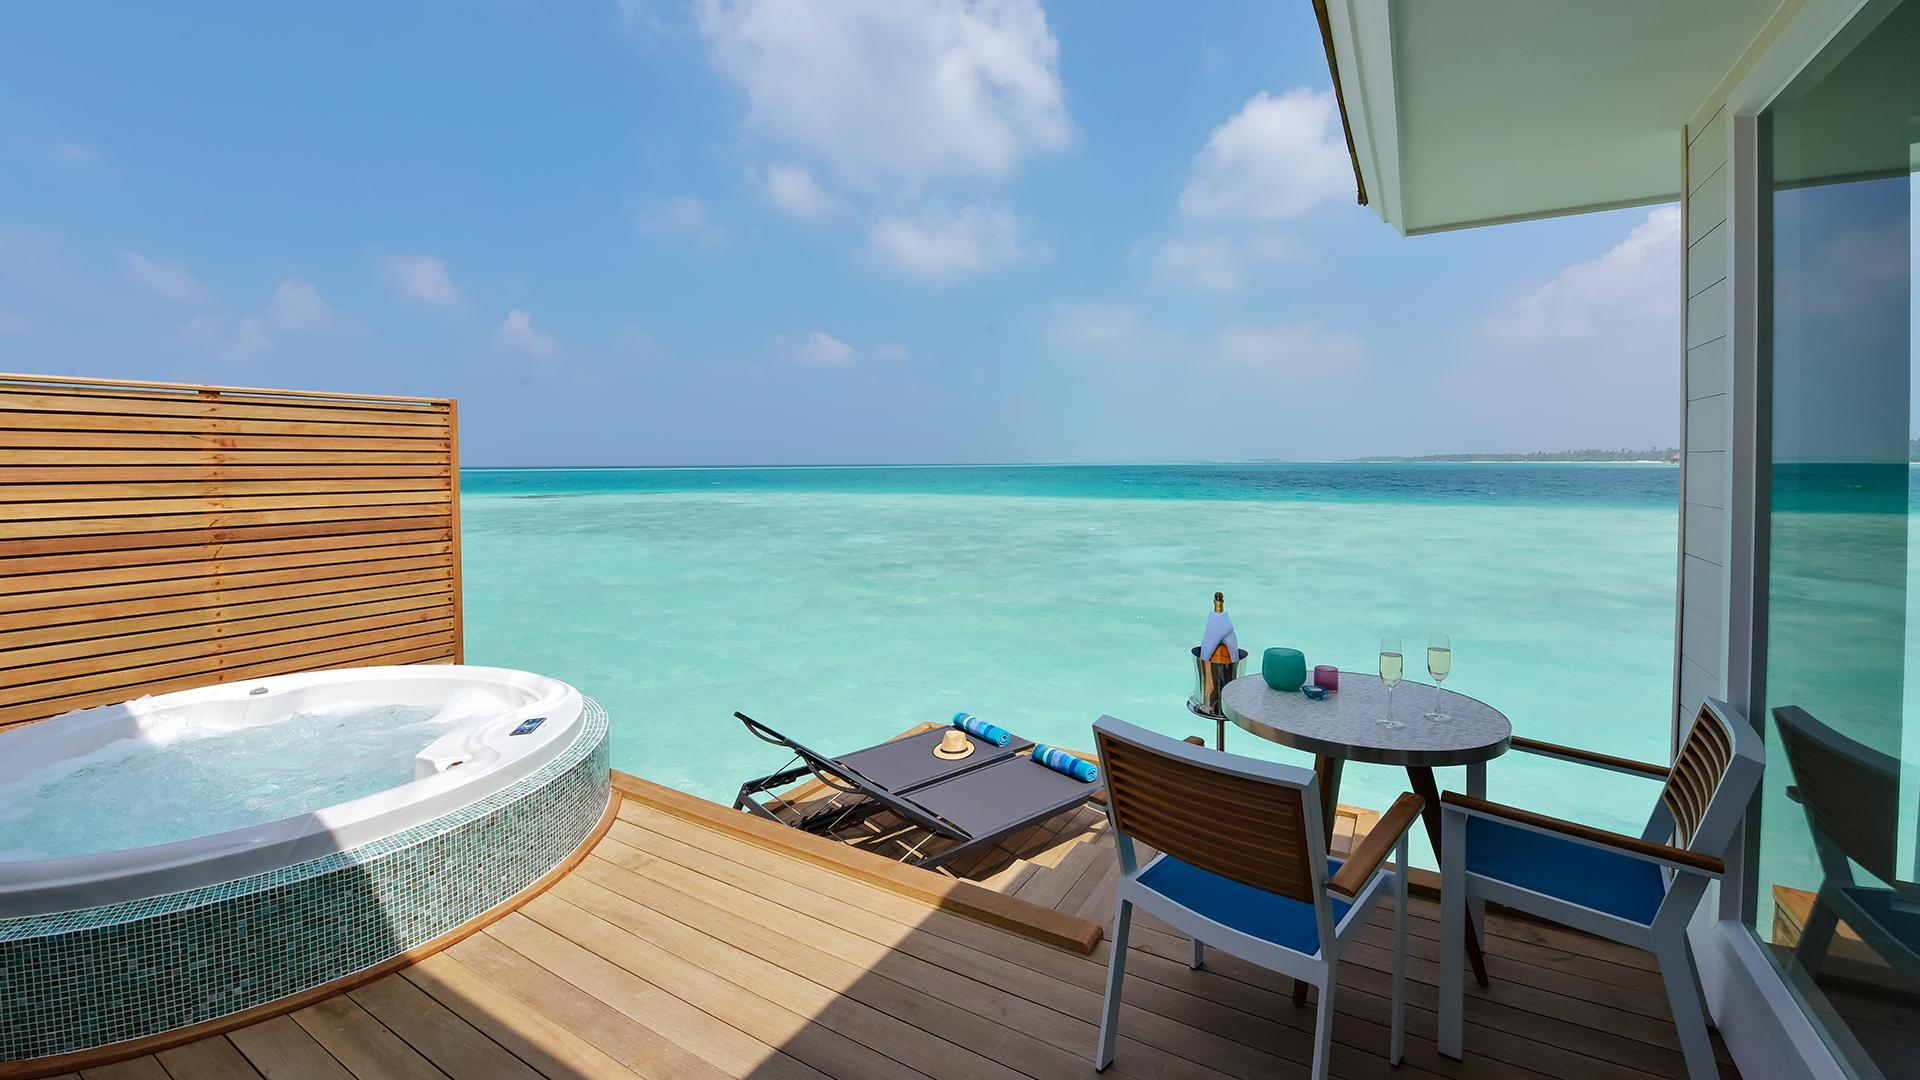 Aqua Villa with Swirl Pool image 1 at Kandima Maldives by null, Central Province, Maldives